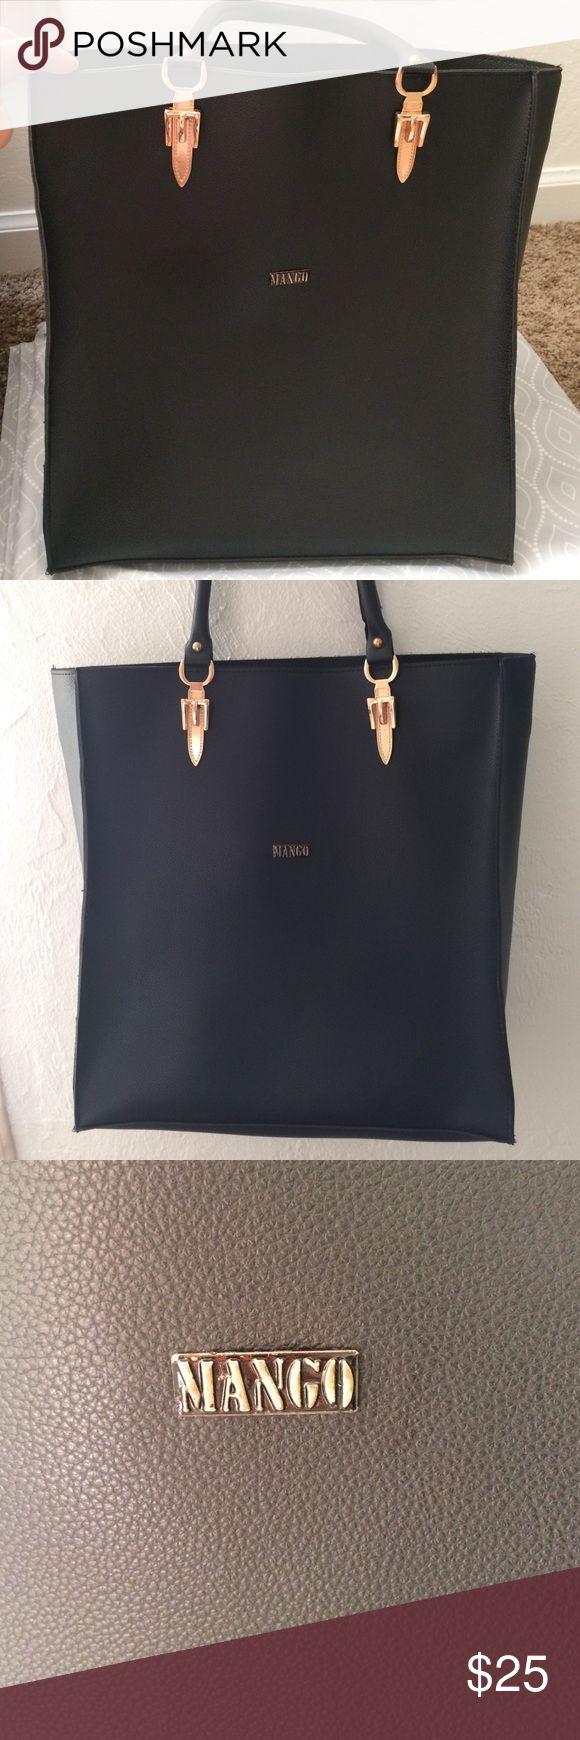 Mango bag Mangi bag ( European Brand) , great condition Mango Bags Totes